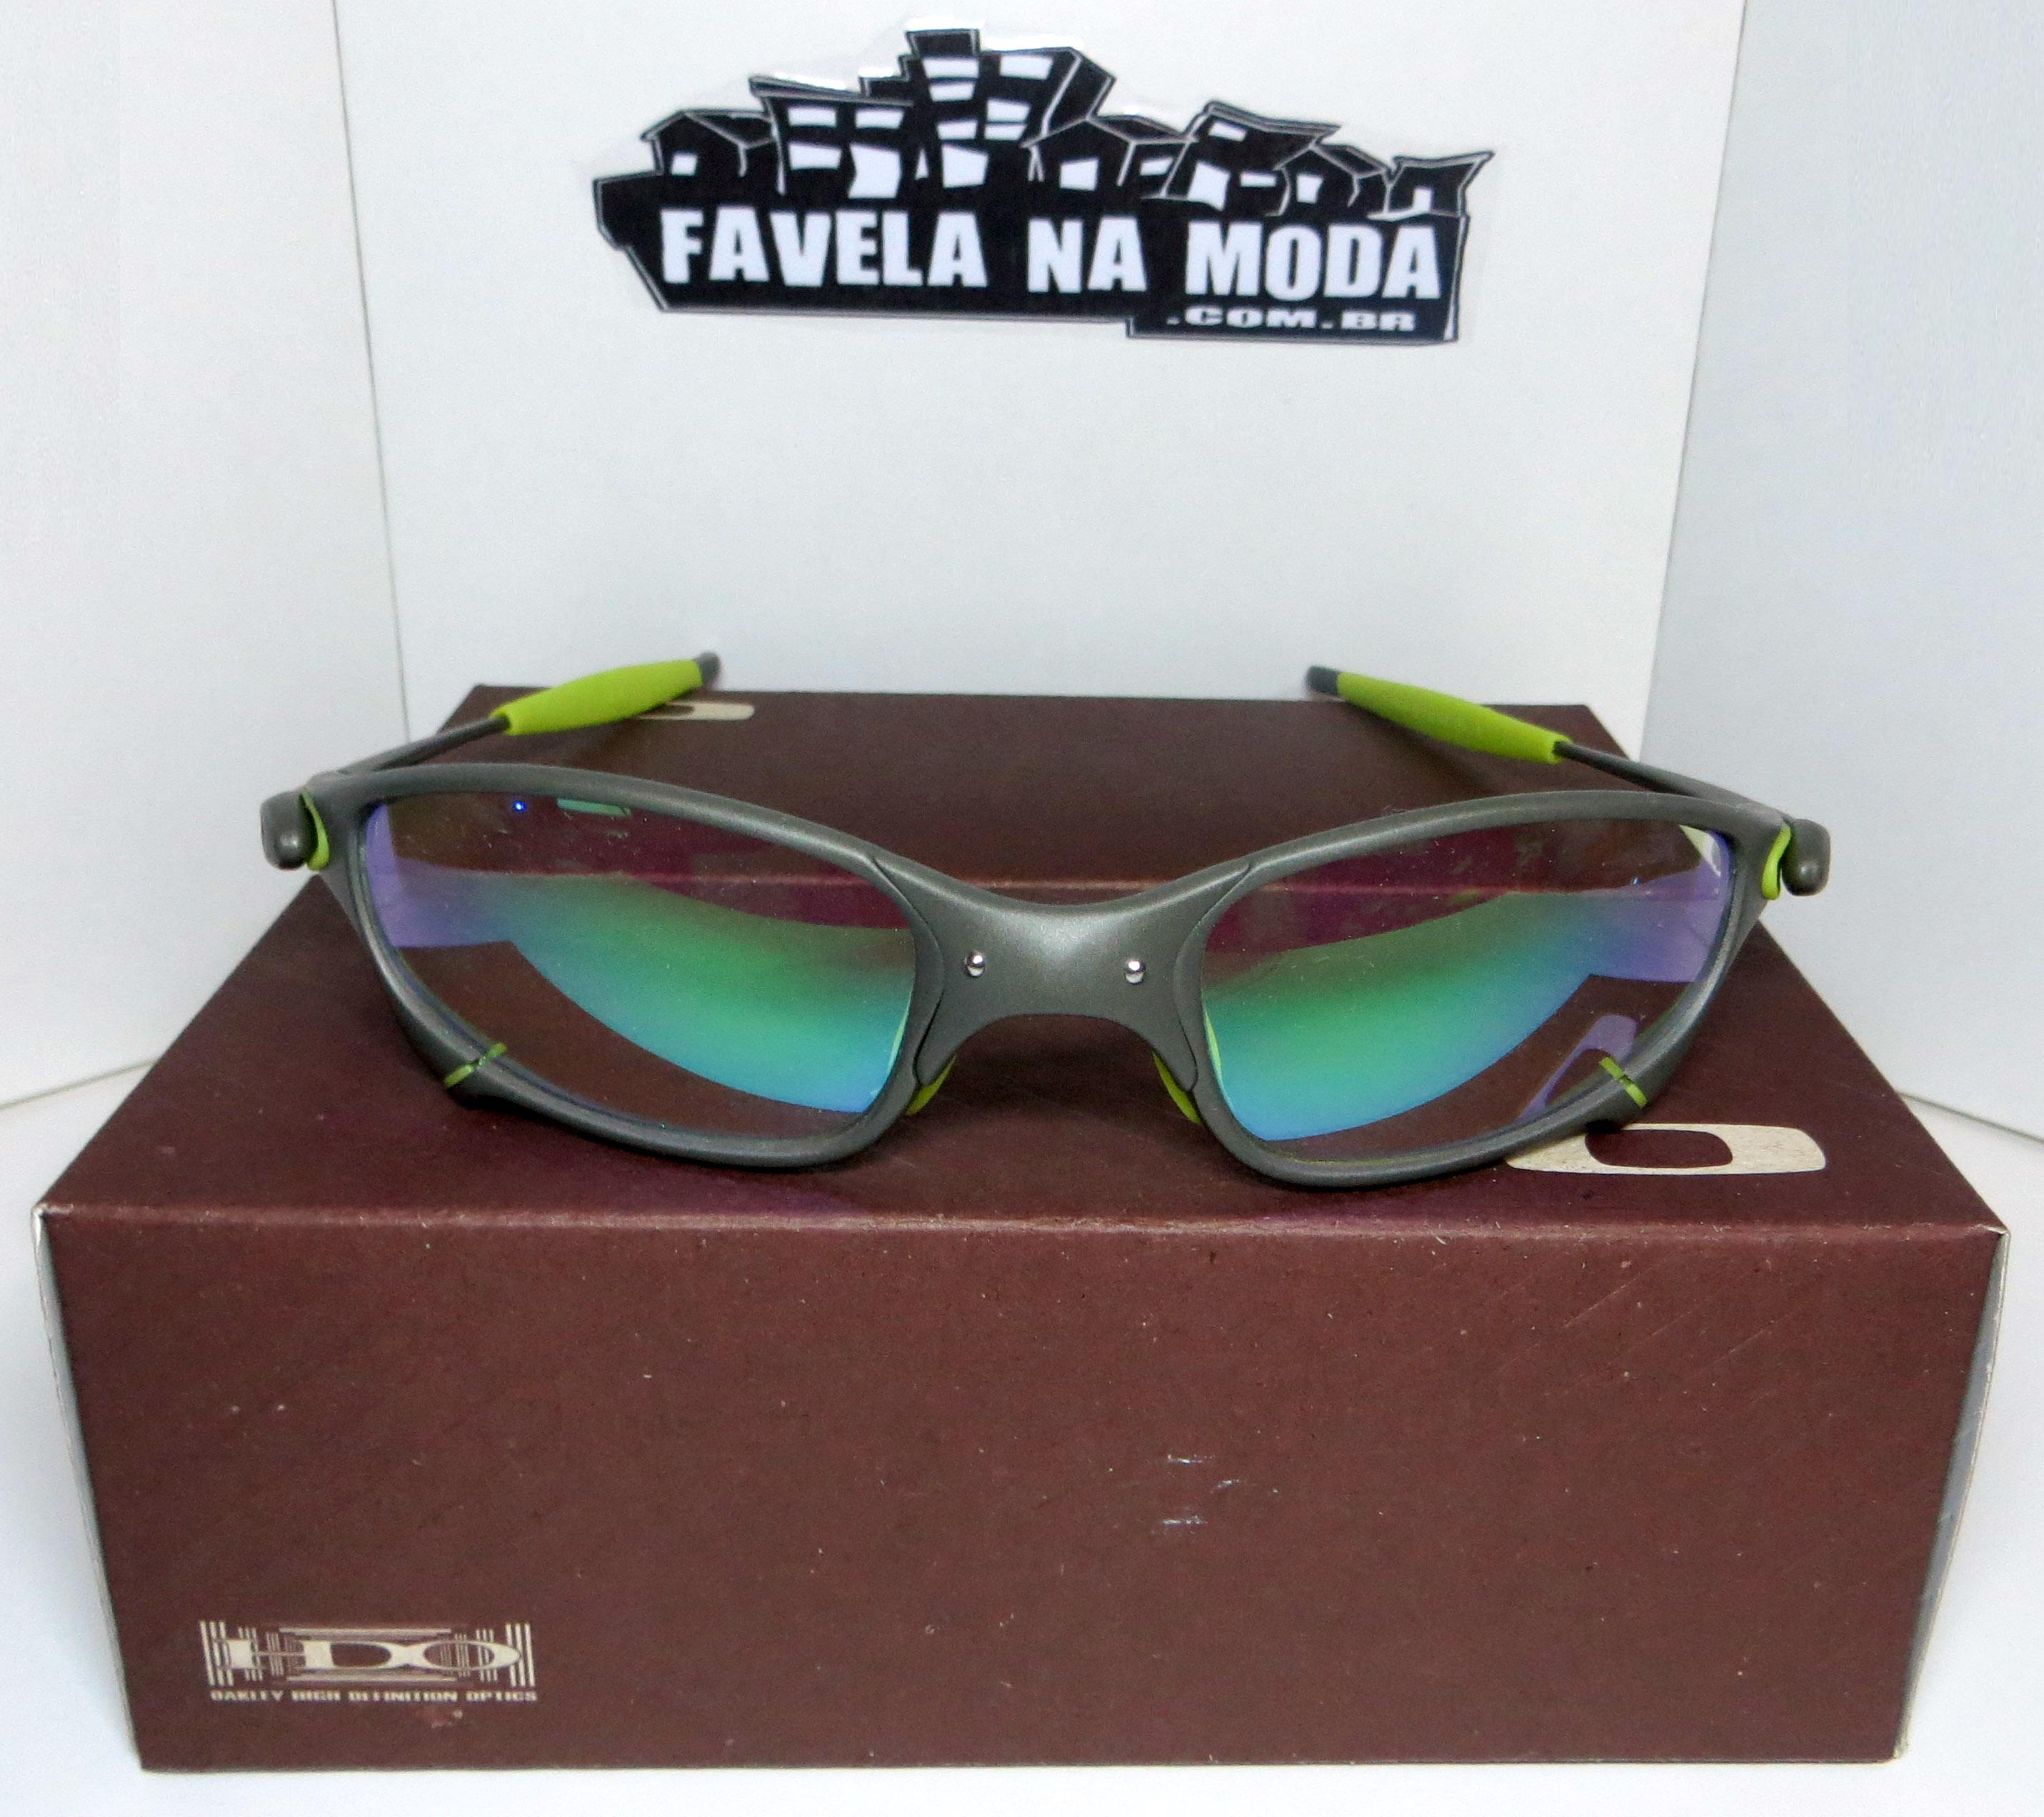 2d308d0a4ee6f Óculos Oakley Juliet - X-Metal   Clear Verde   Borrachinhas Verdes - Favela  na Moda Imports